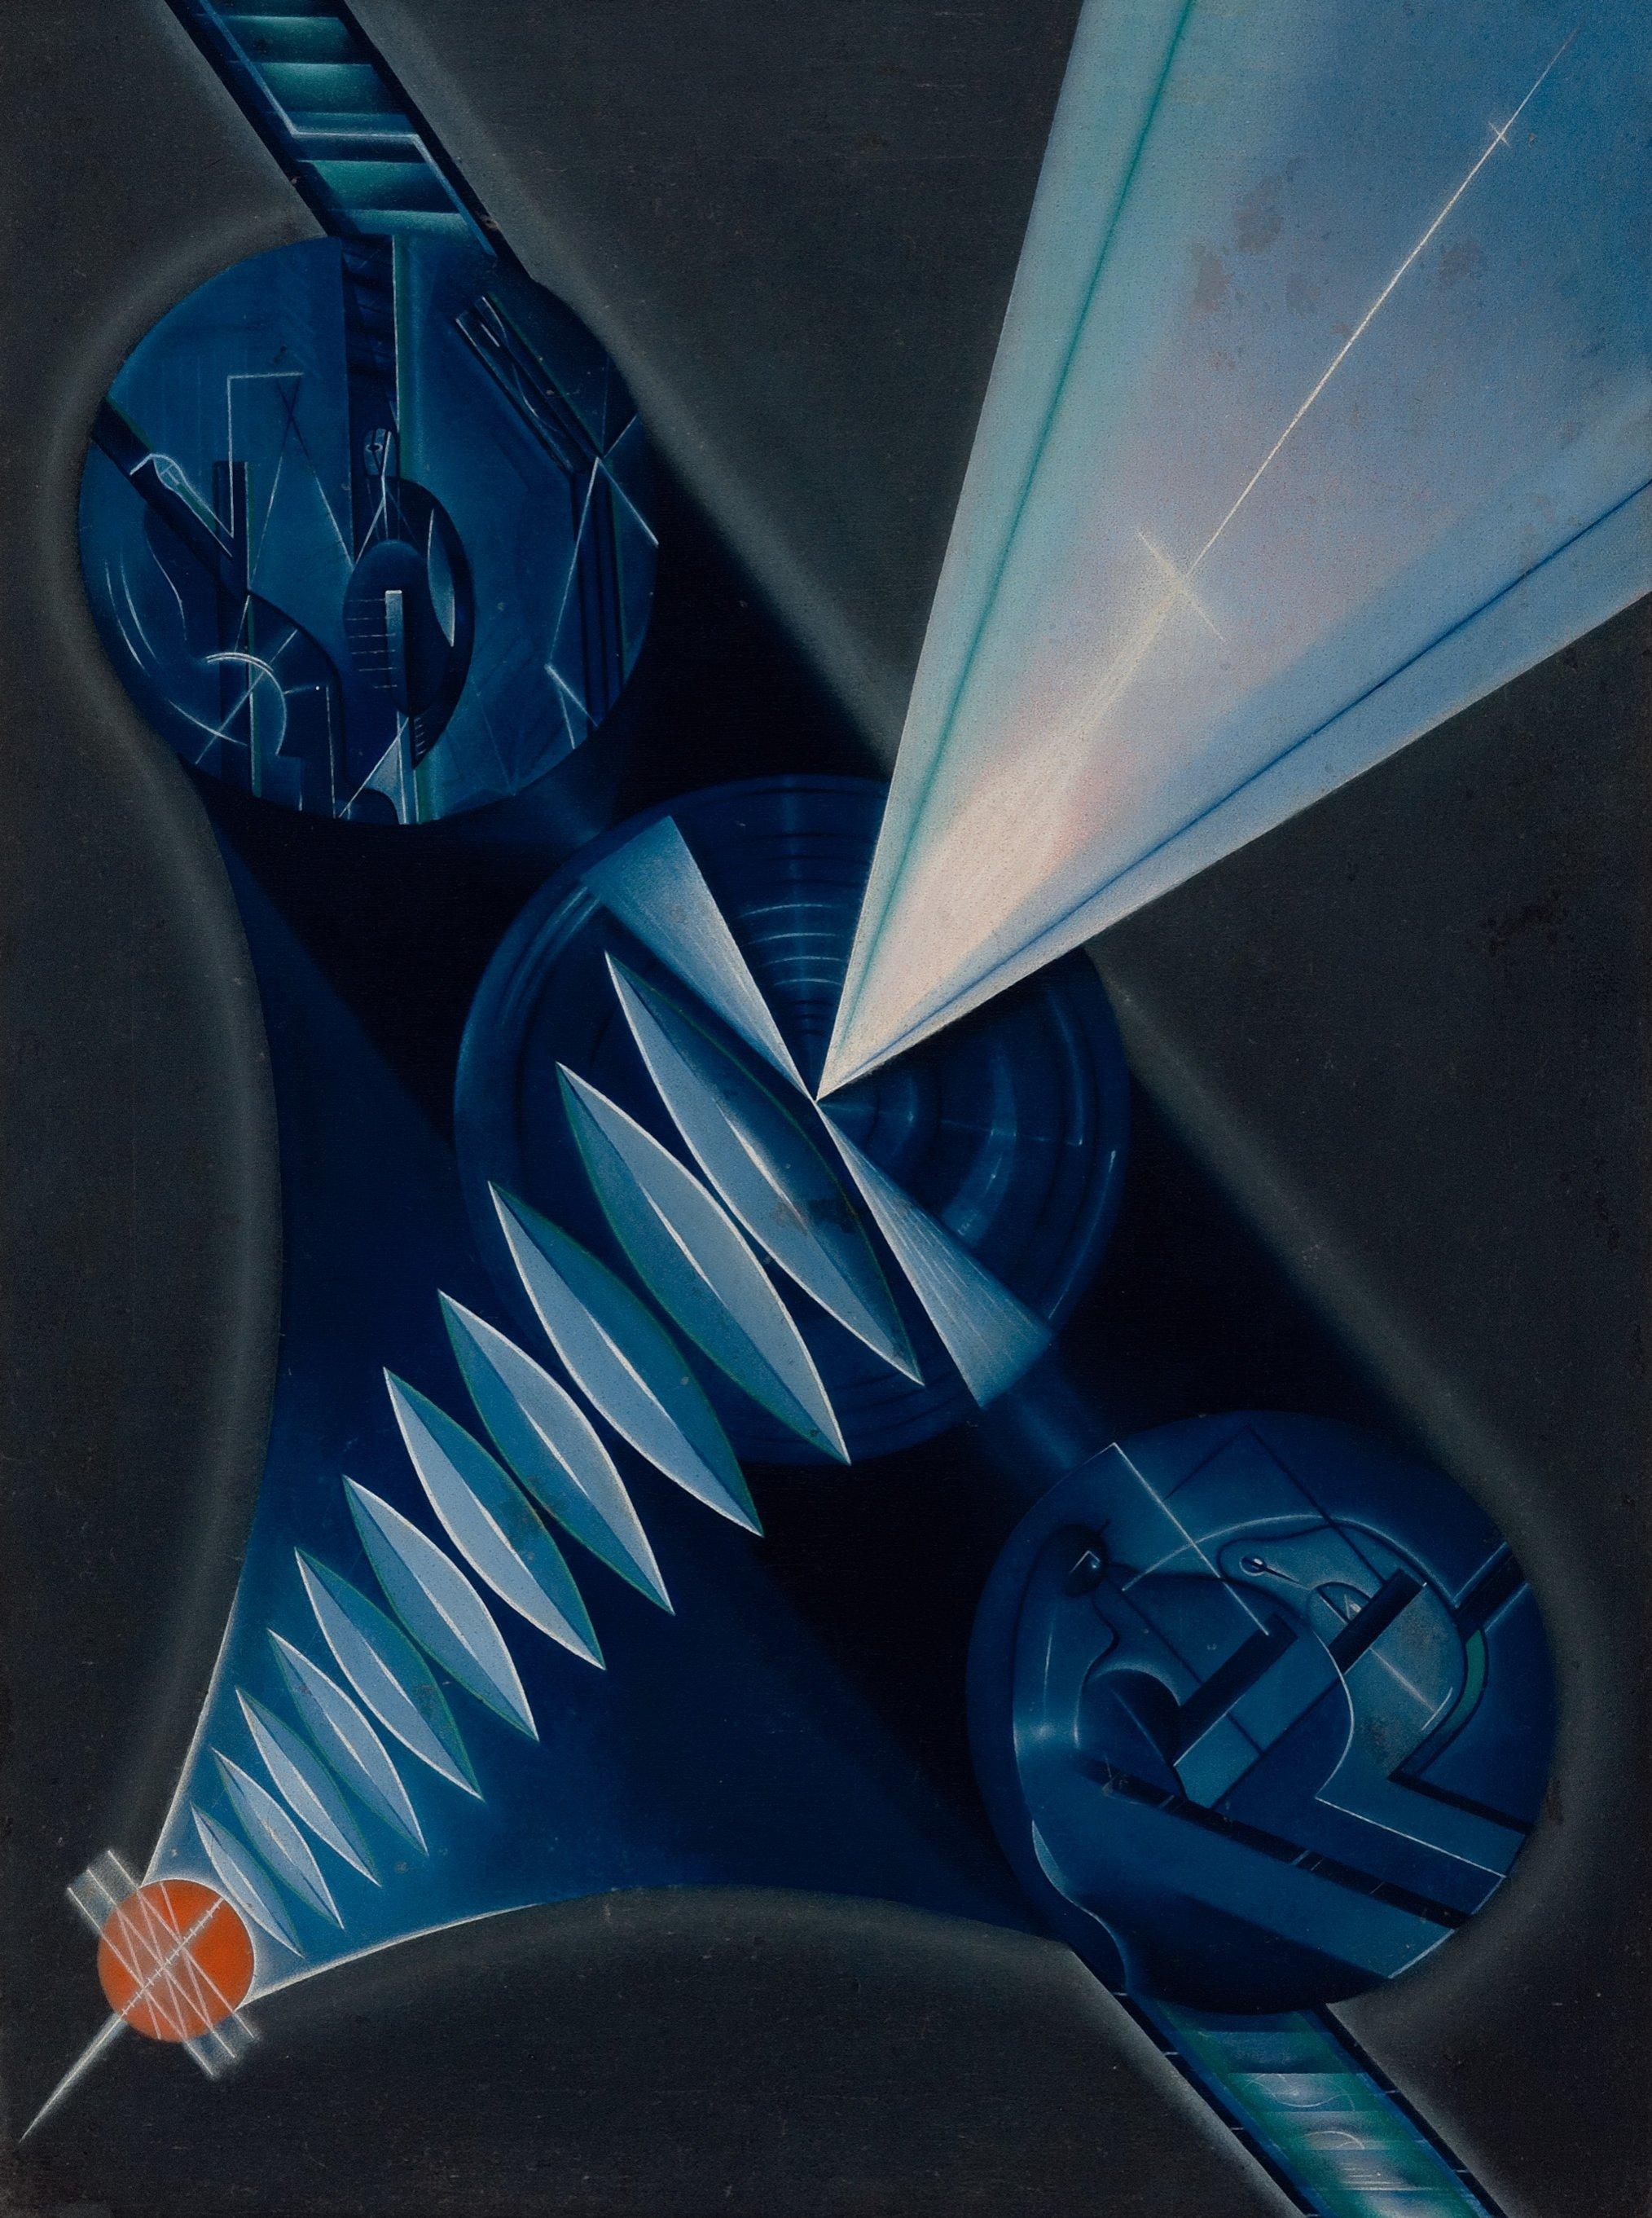 Kliment Redko, 'Dynamite,' 1922, oil on canvas, 62.6 by 47.6 centimeters. (Courtesy of Sakıp Sabancı Museum)